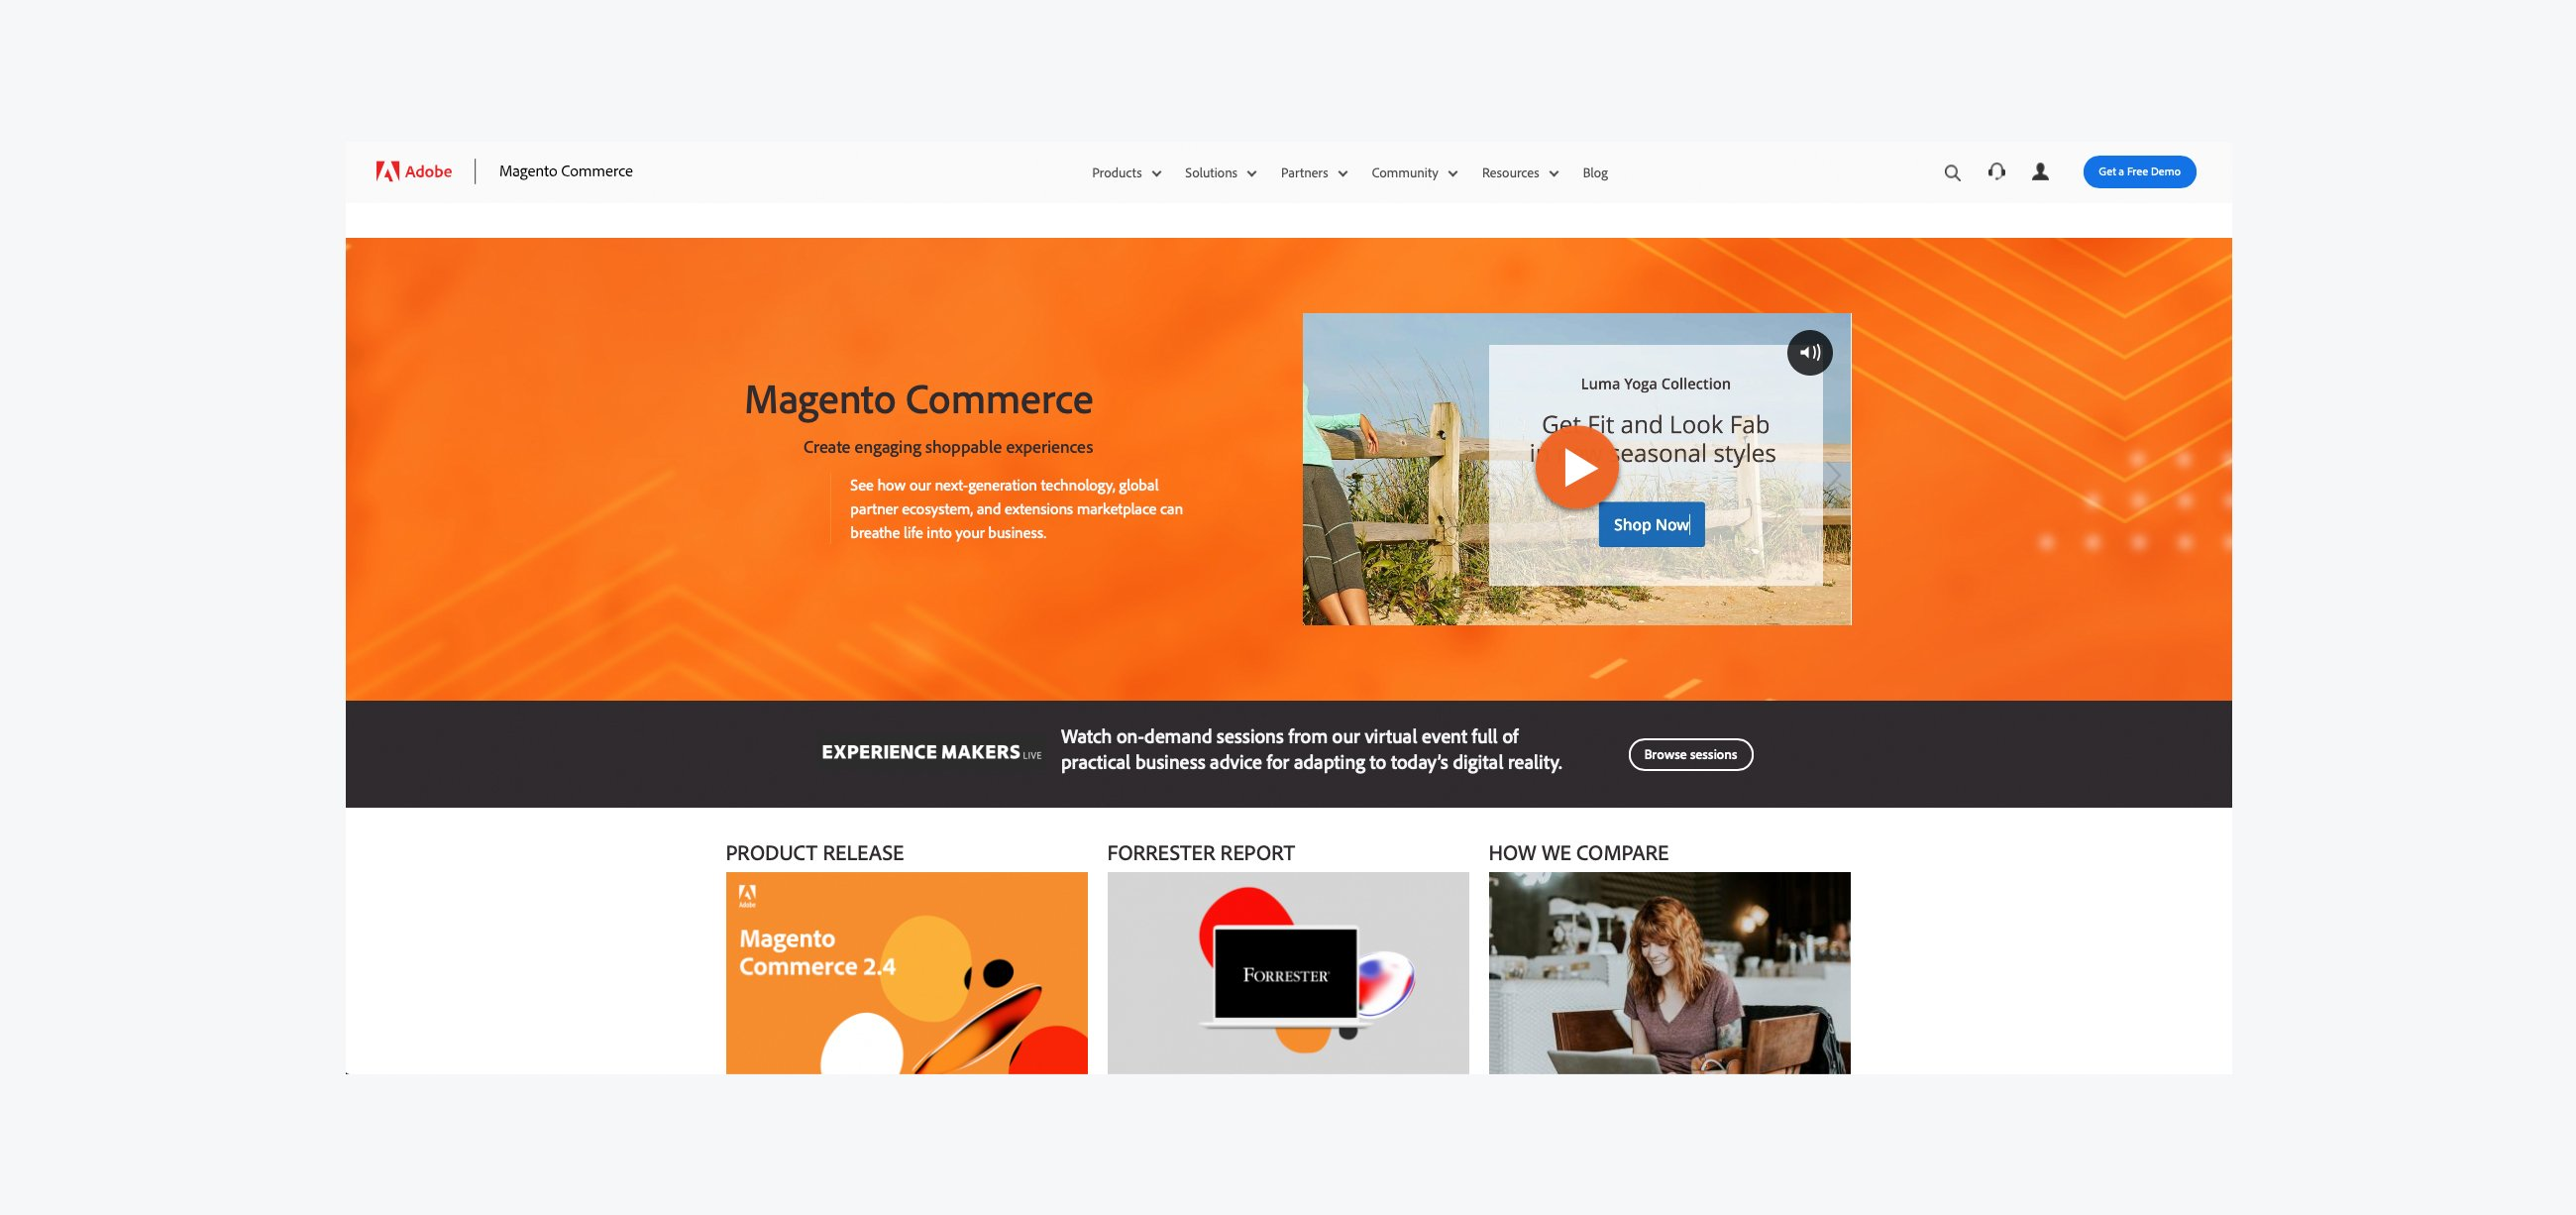 Top 10 eCommerce Platforms - Magento